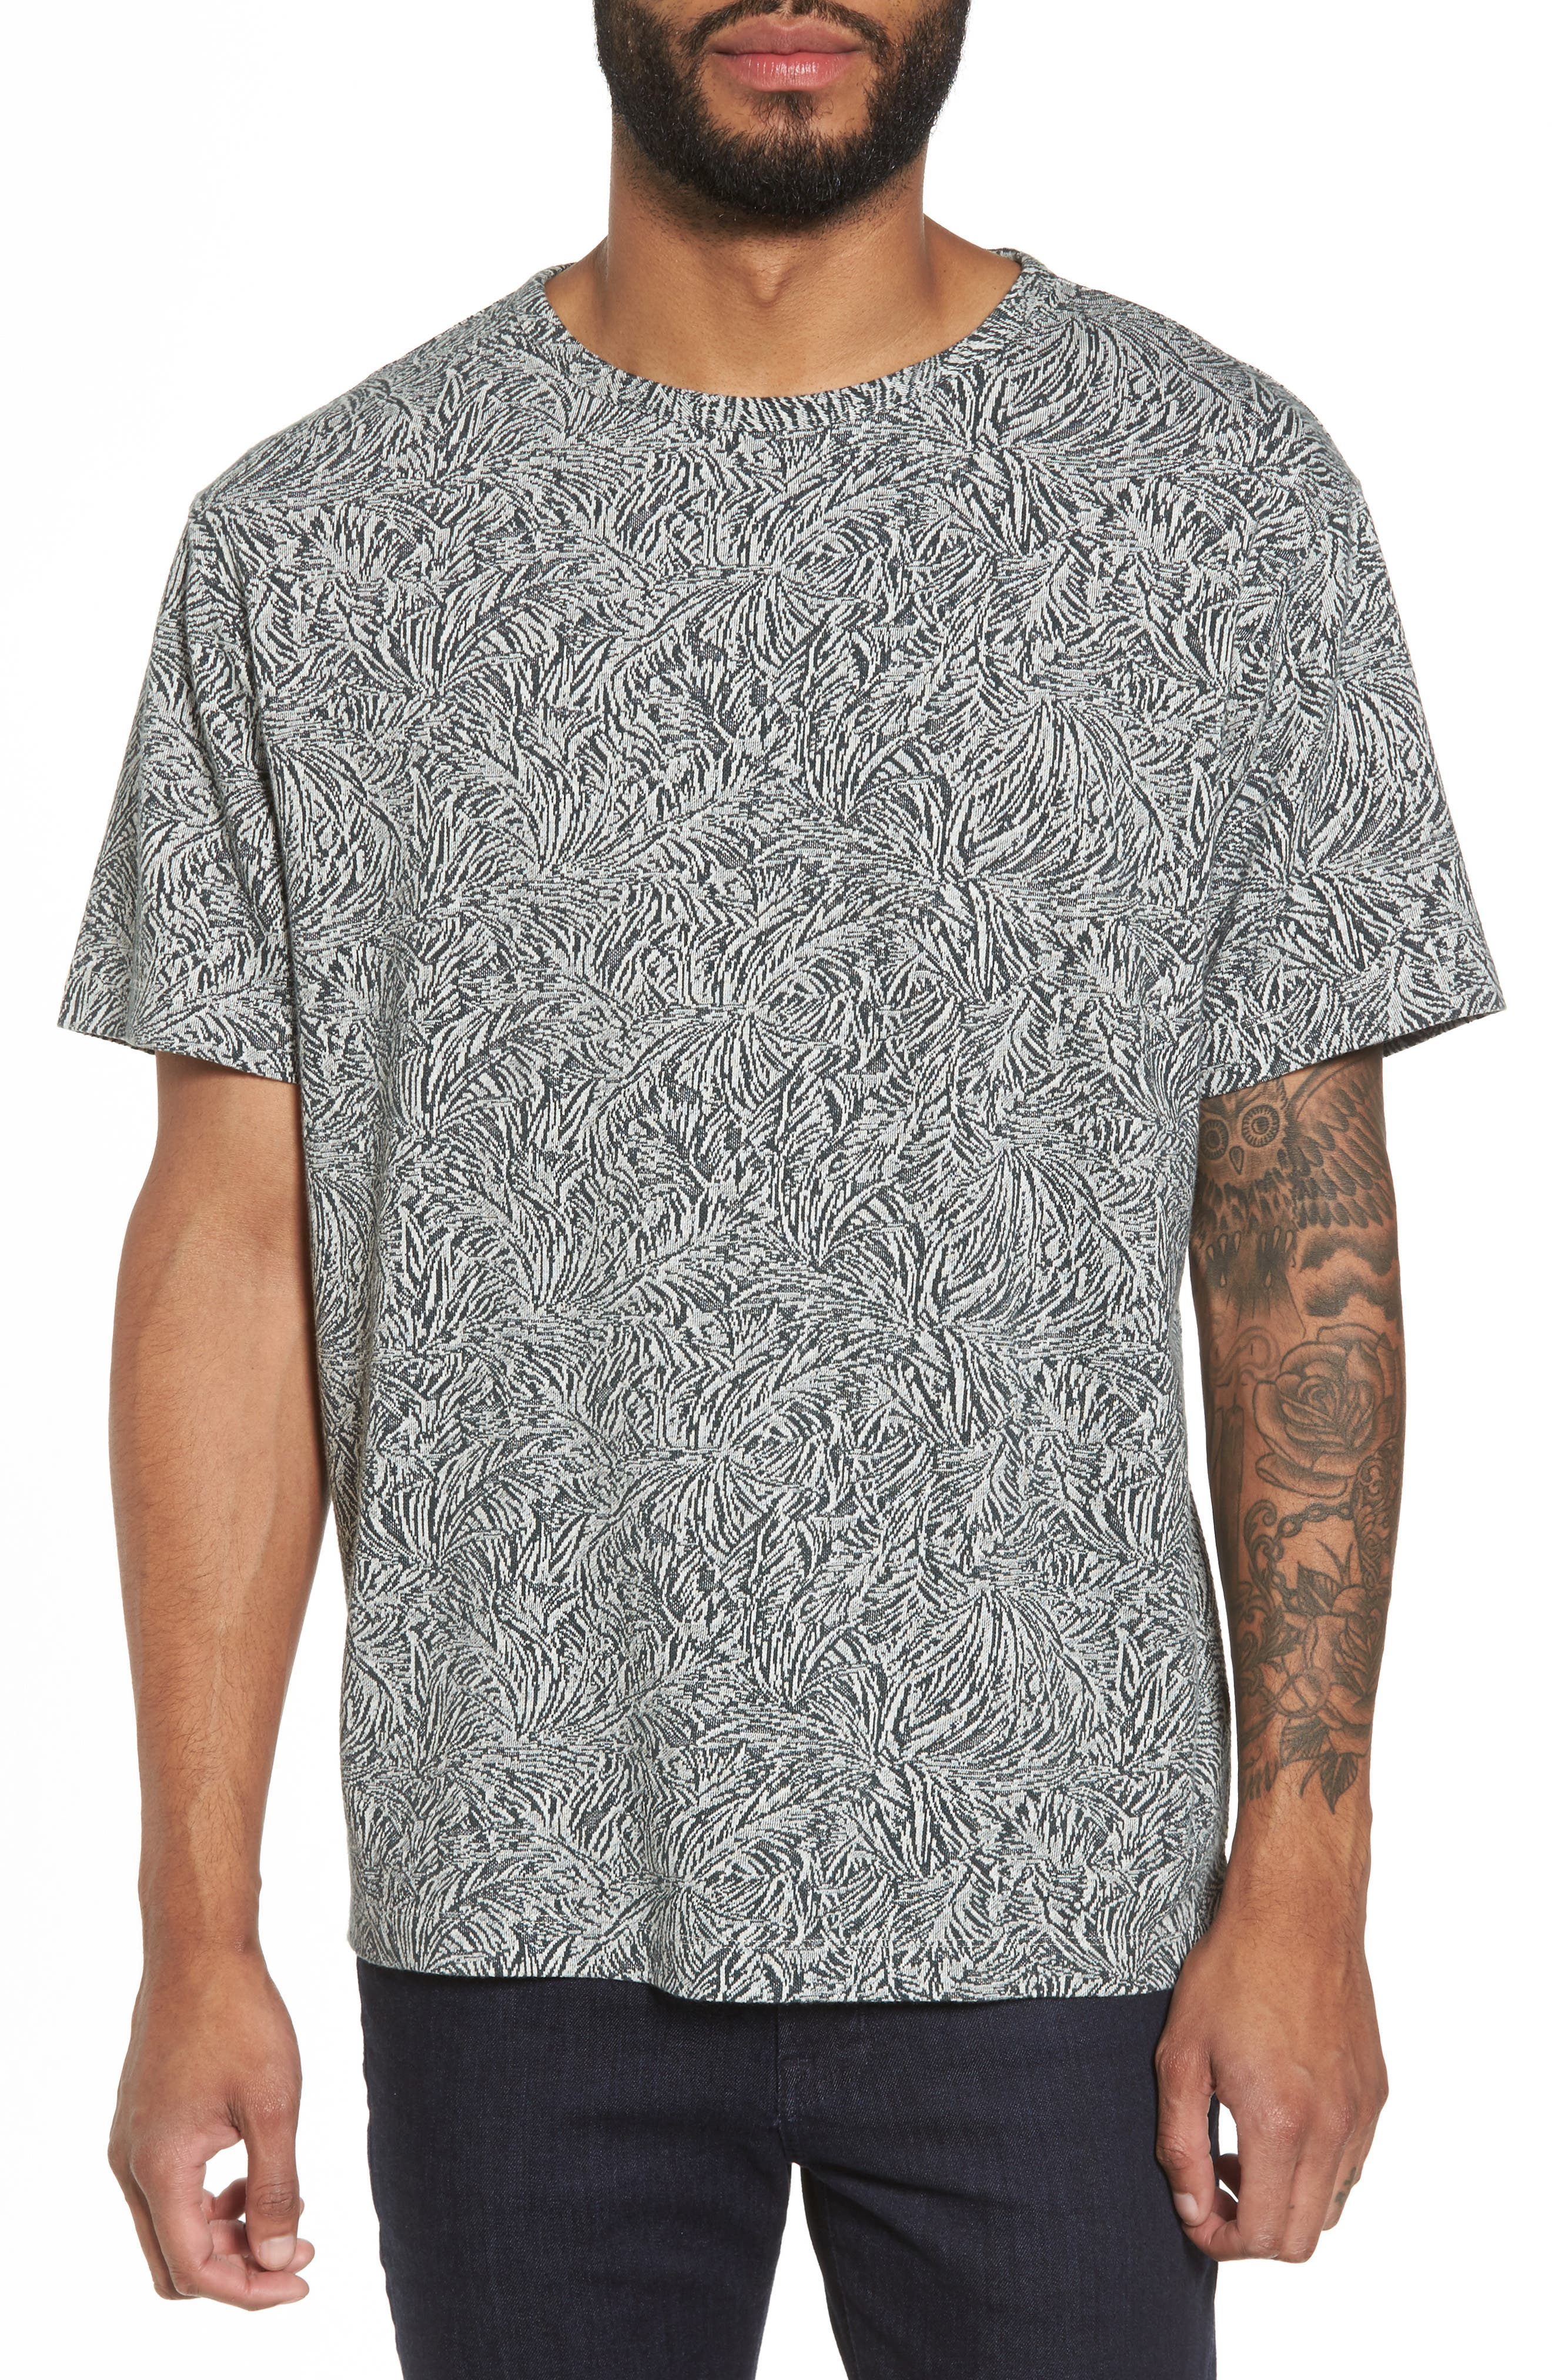 Alternate Image 1 Selected - Theory Palm Jacquard Crewneck T-Shirt